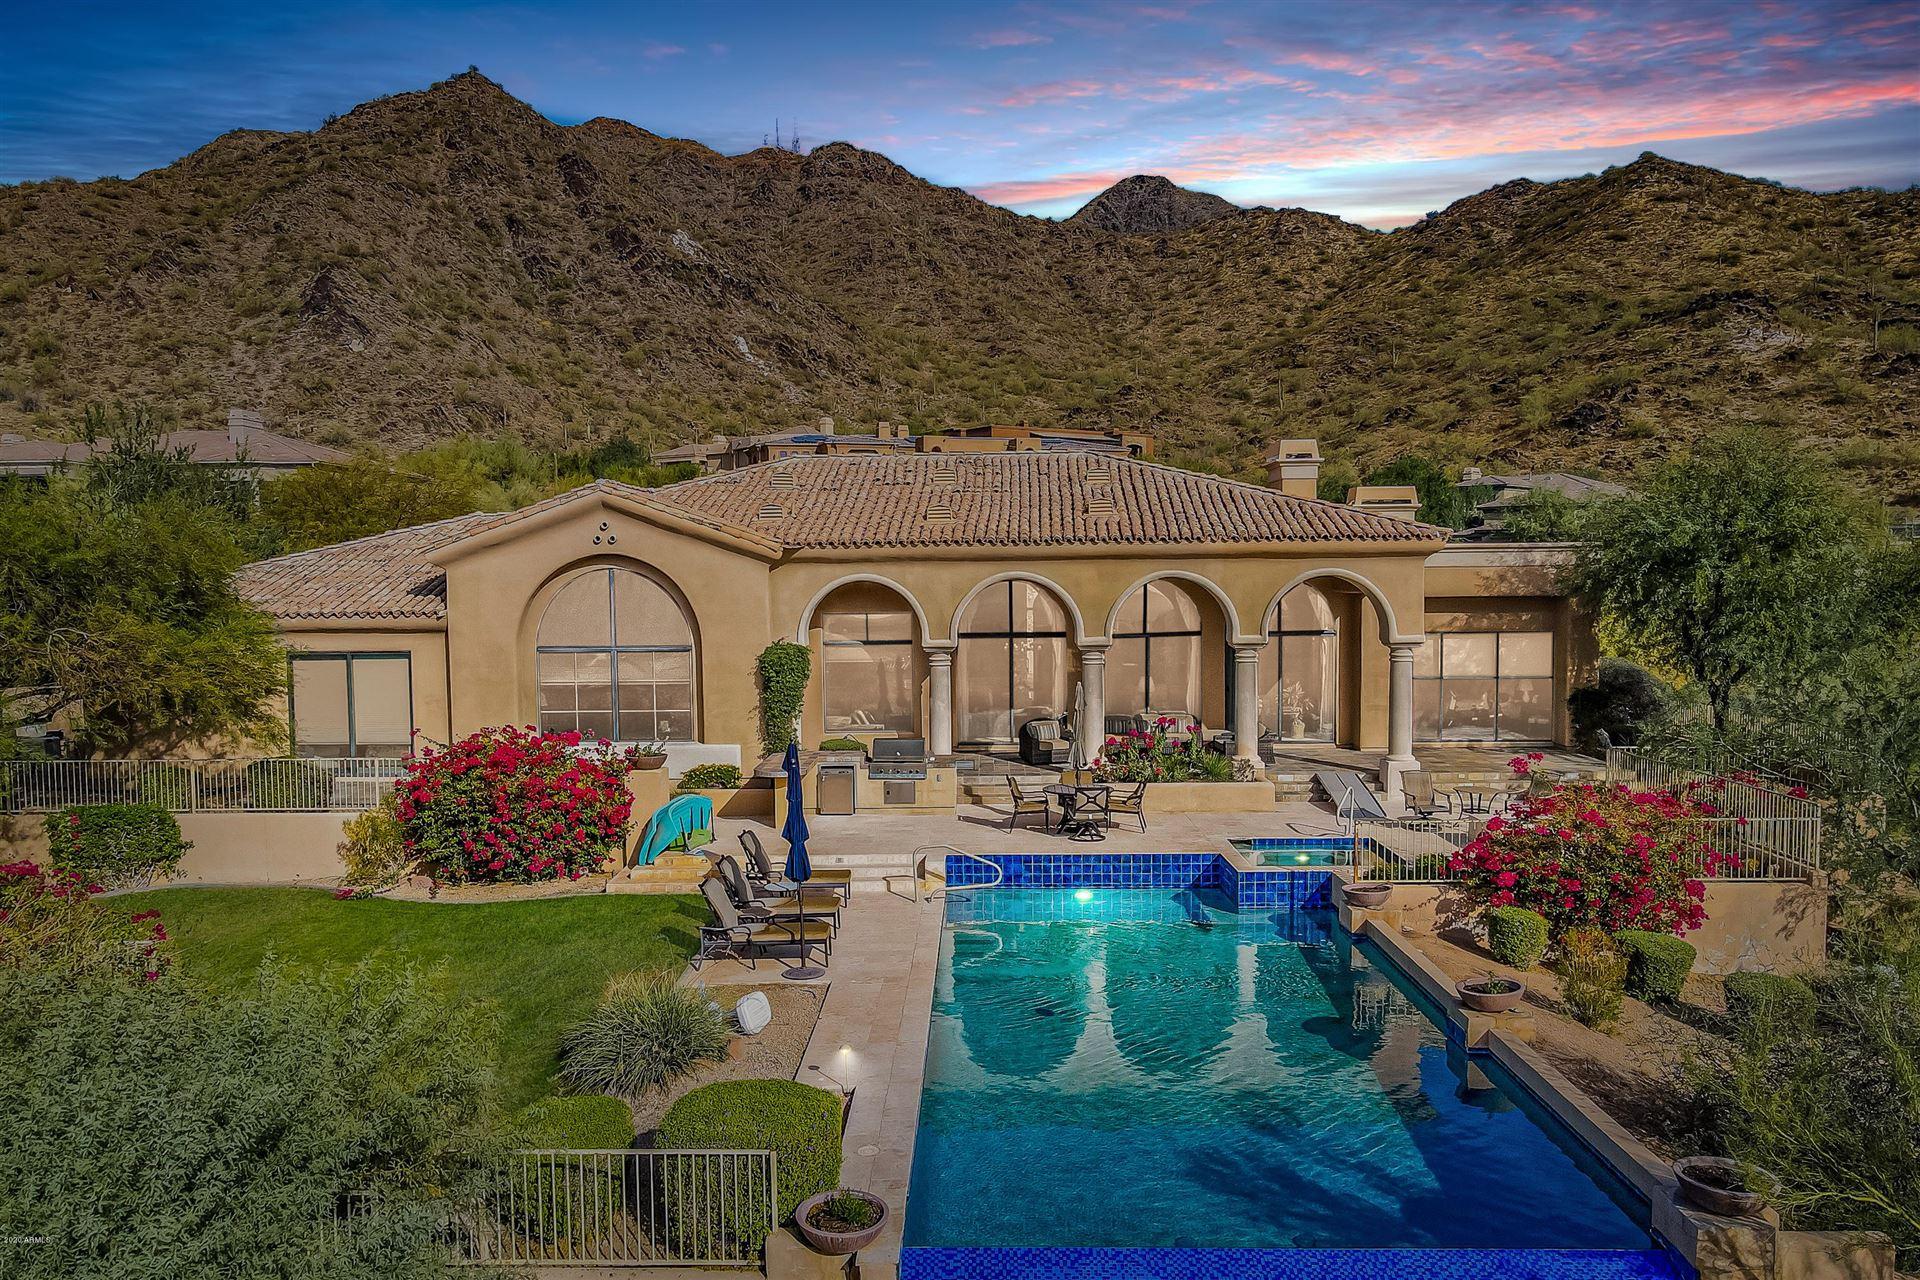 Photo of 11573 E MIRASOL Circle, Scottsdale, AZ 85255 (MLS # 6165583)